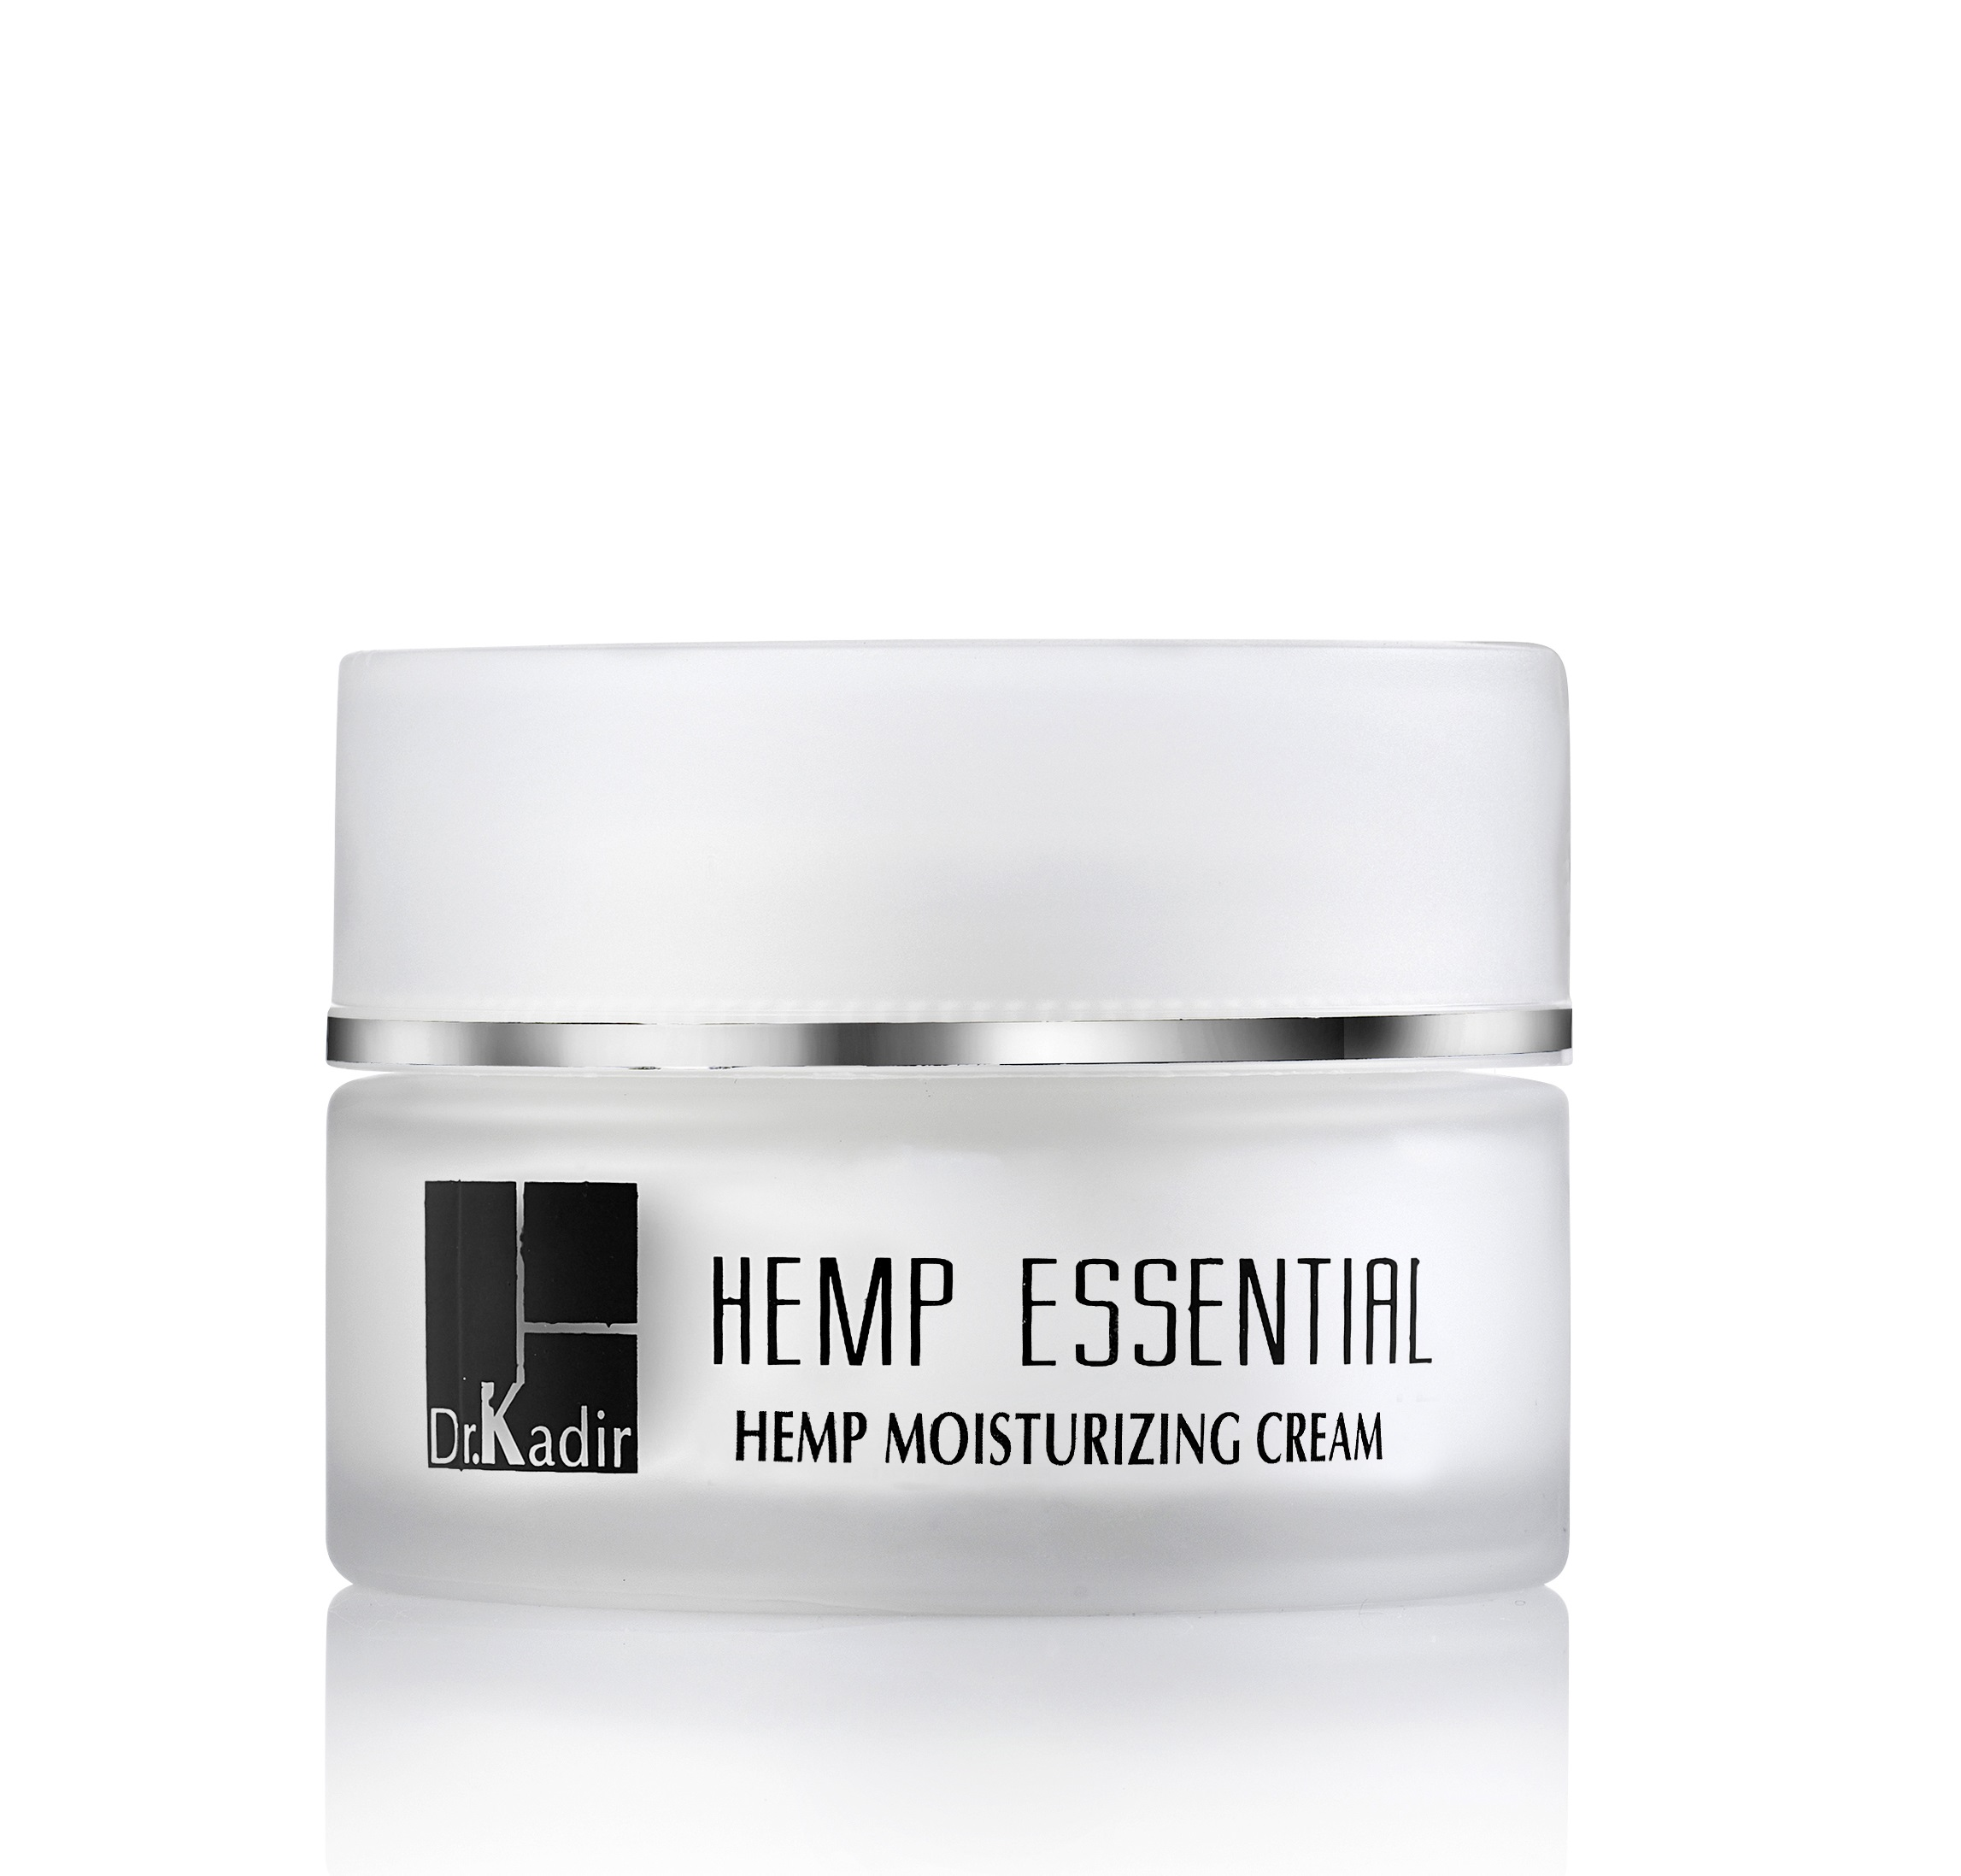 Dr. KADIR Крем увлажняющий конопляный / Hemp Moisturizing Cream 50 мл фото